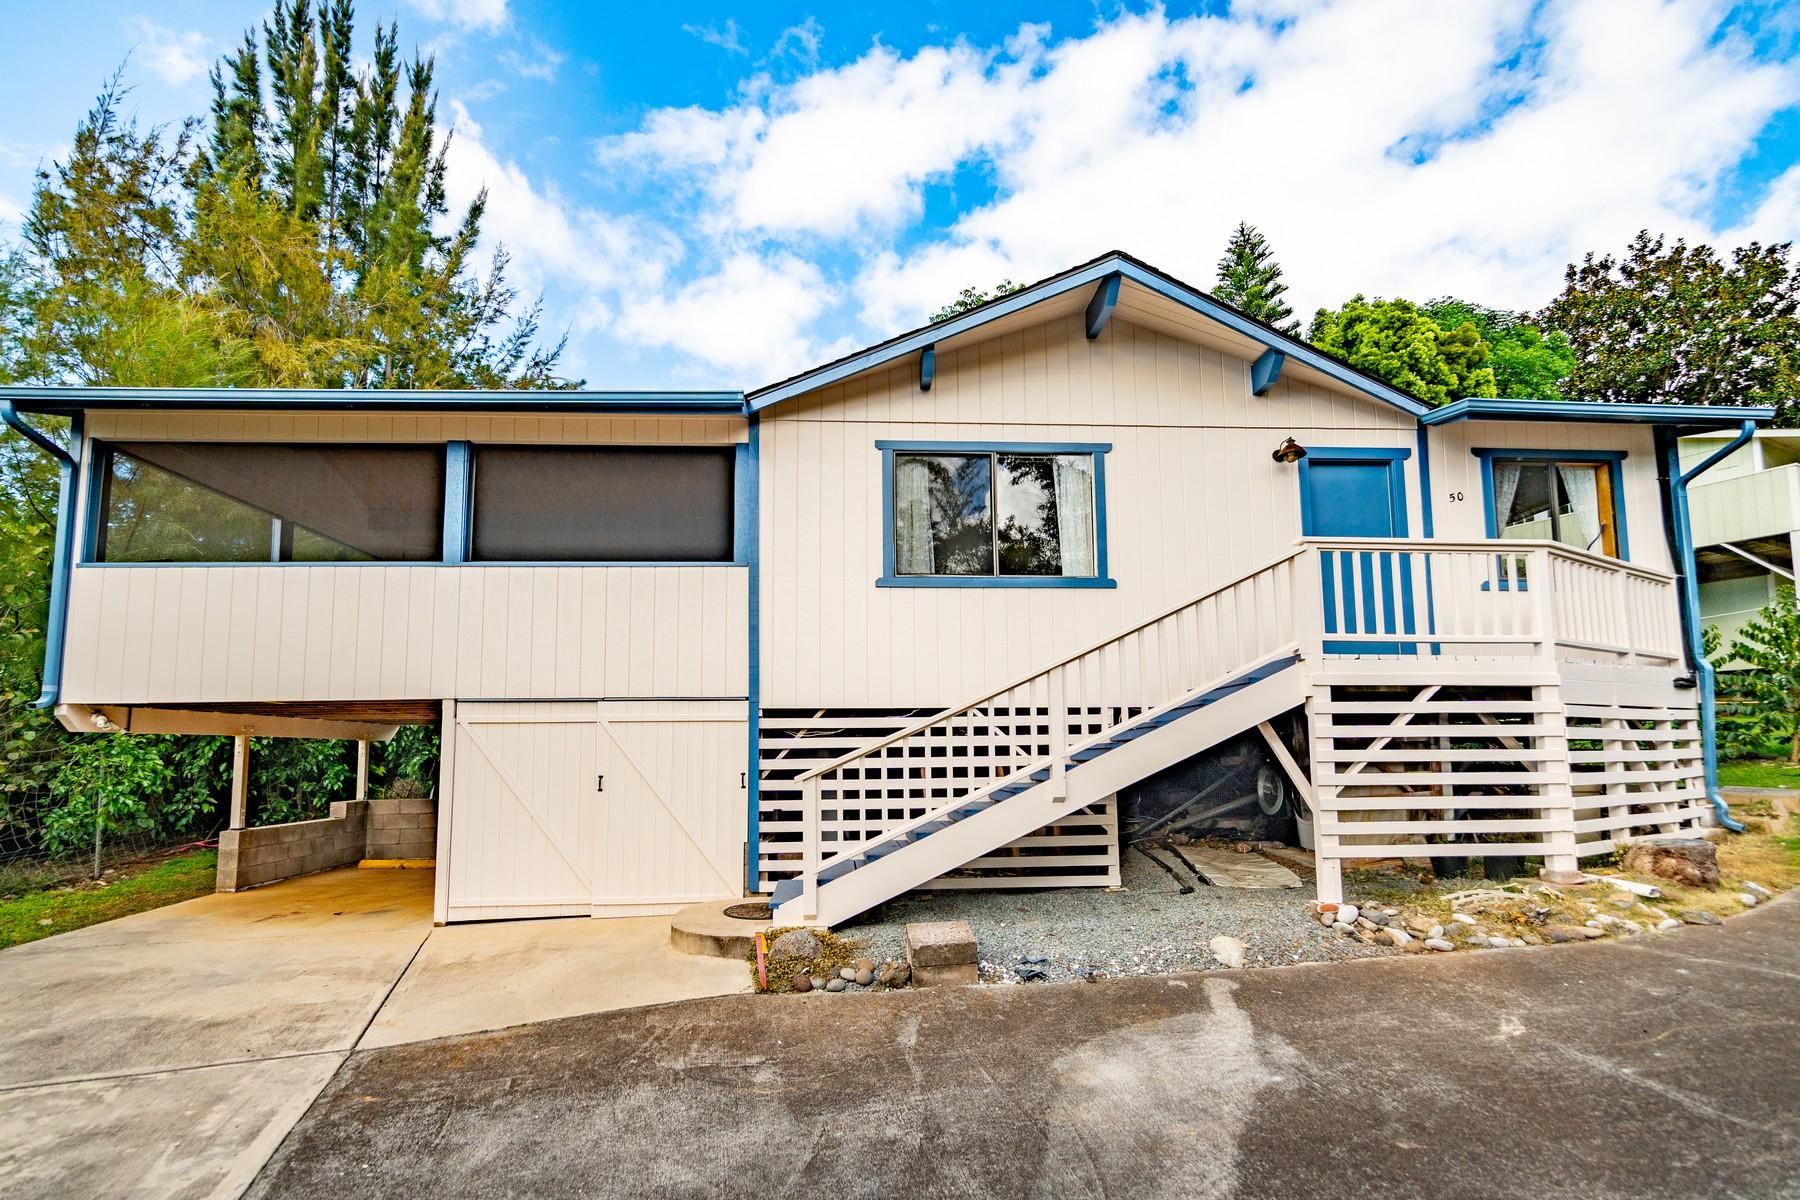 Single Family Home for Active at Cozy & Comfortable Upcountry Living 50 Kulalani Dr Kula, Hawaii 96790 United States